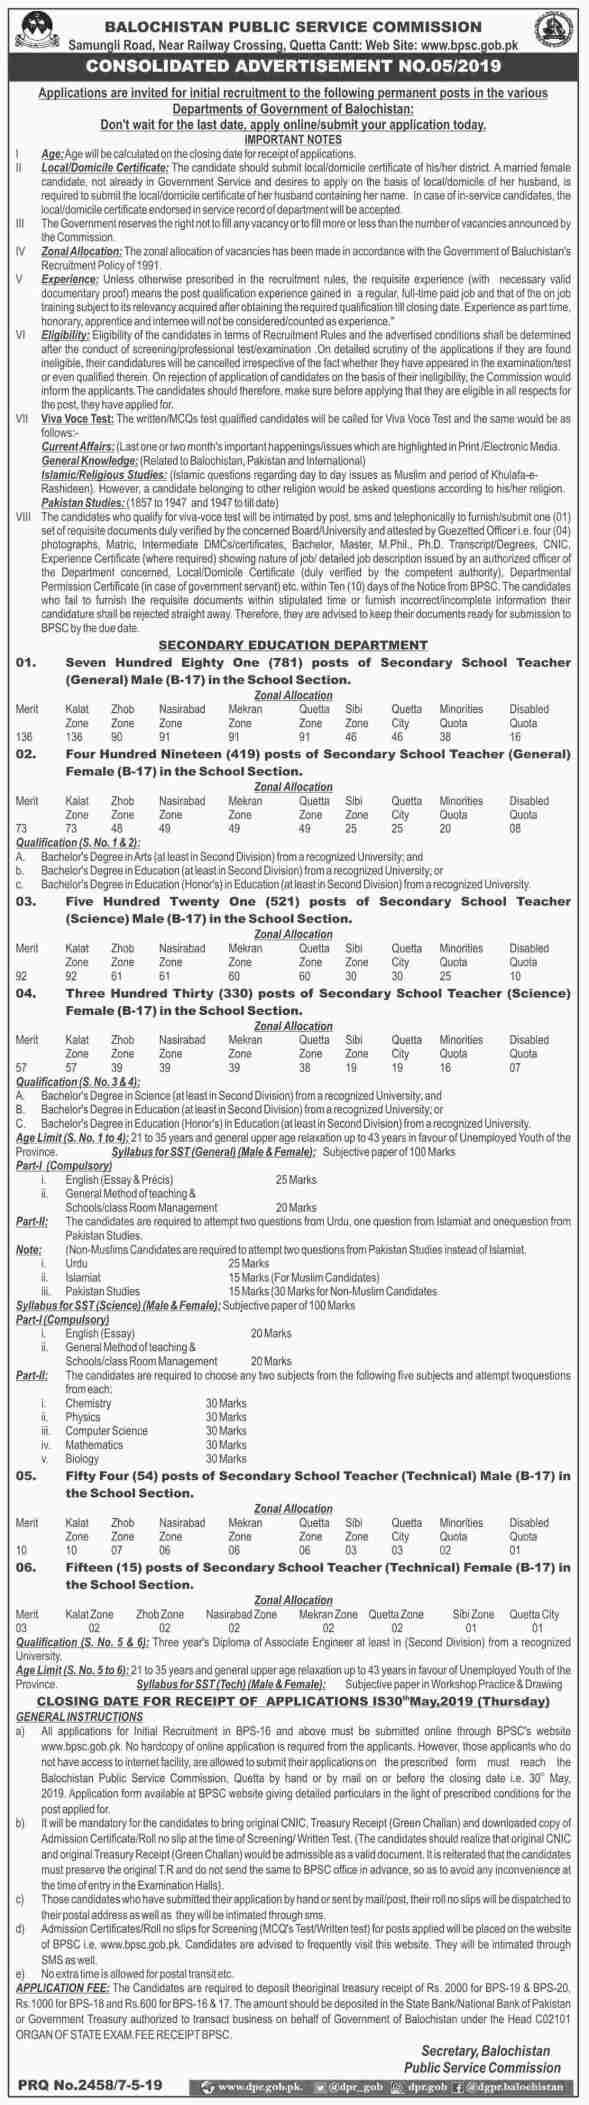 Secondary Education Department Balochistan BPSC Jobs 2019 Apply Online